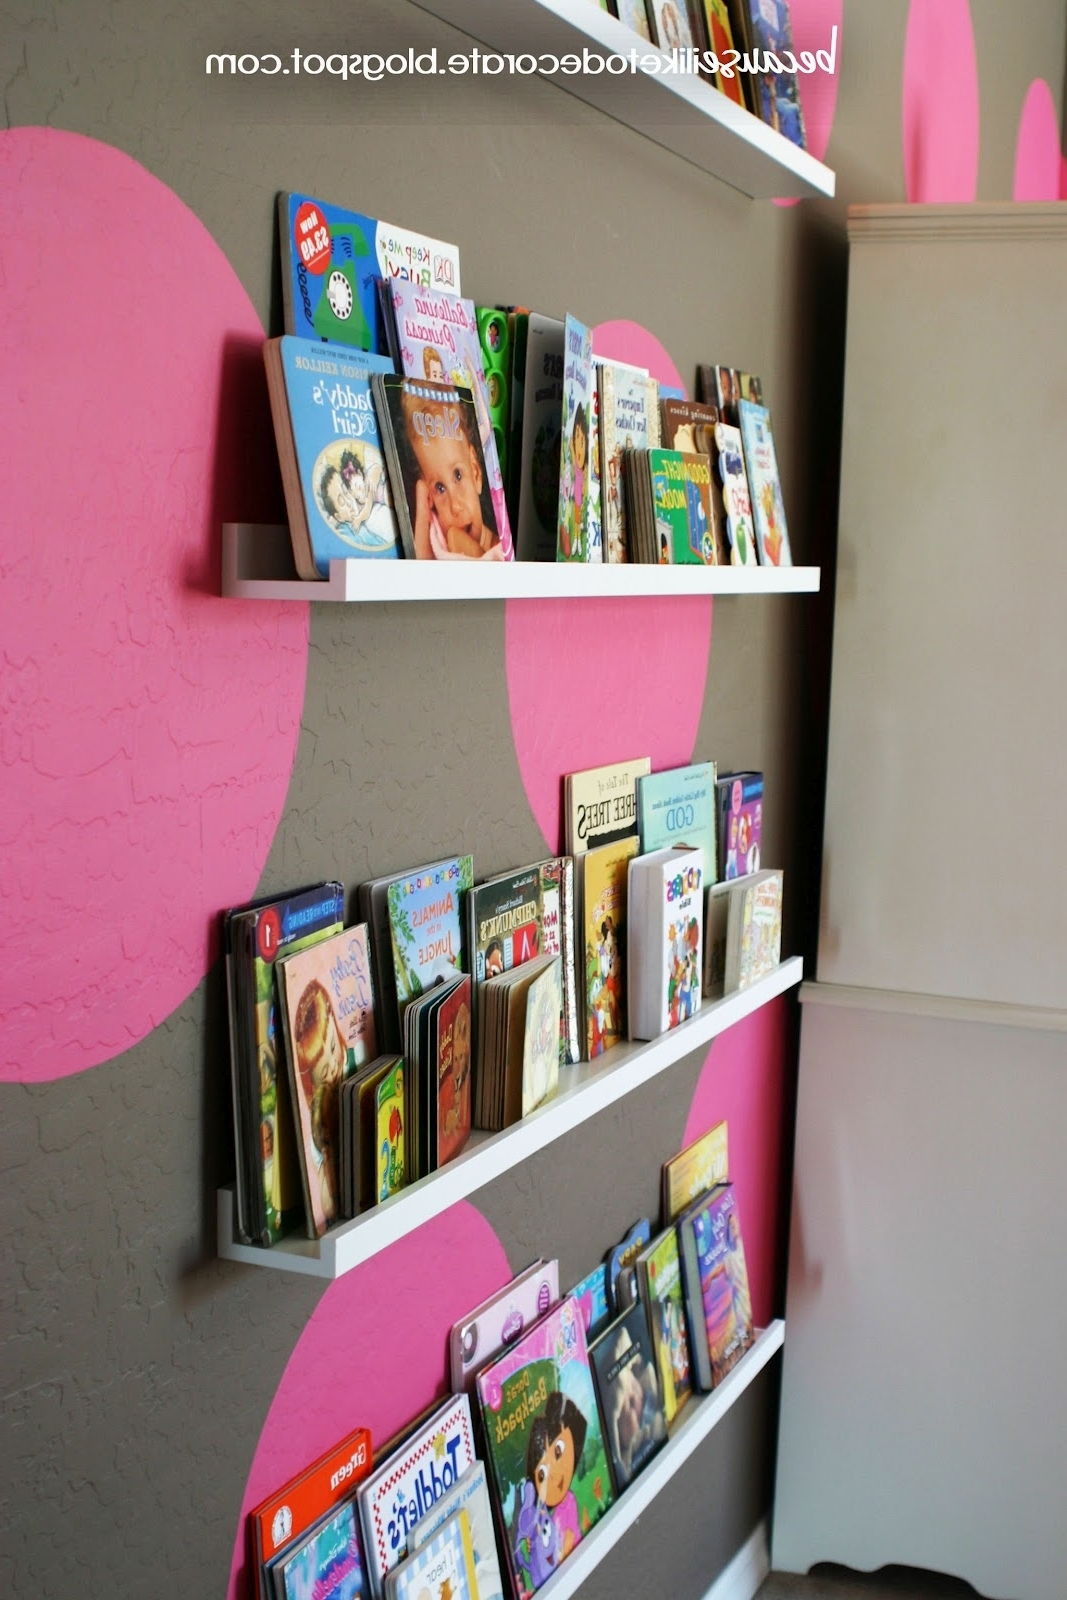 Ikea Picture Frame Ledges The Girls' Room Progress 1.4 – Toddler Regarding Preferred Toddler Bookcases (Gallery 7 of 15)